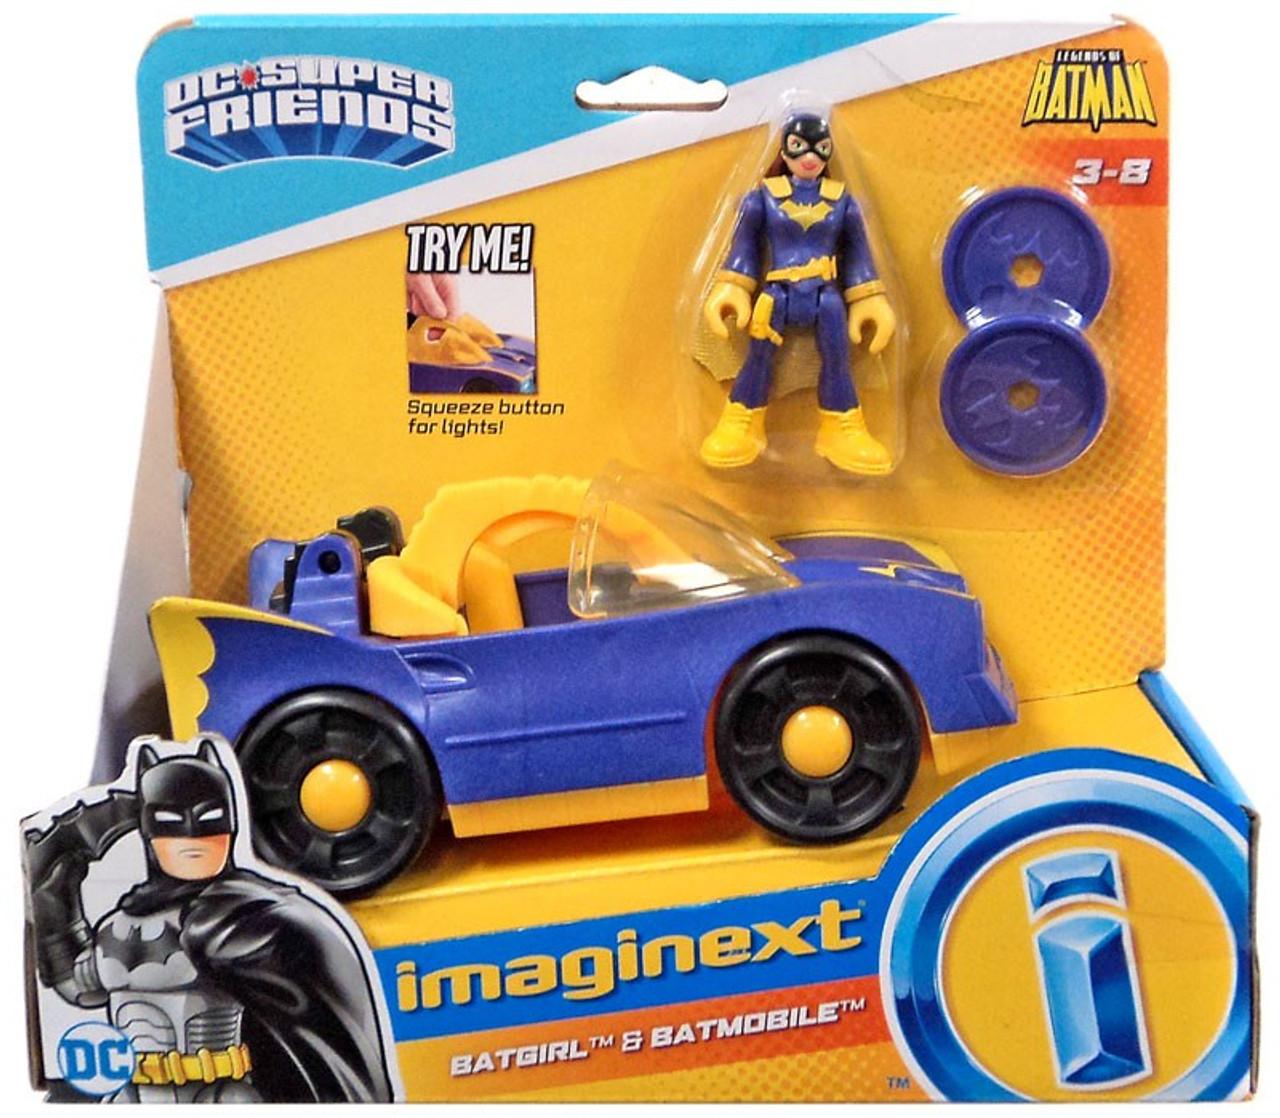 Fisher-Price Imaginext Legends Of Batman Batgirl City Replacement Harley Quinn